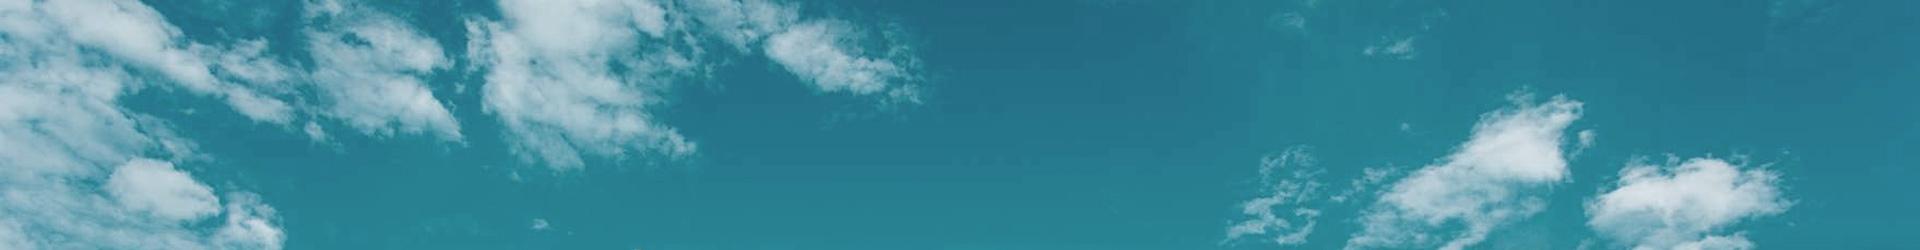 Assainissement Dax, Assainissement Landes, Assainissement Soorts-Hossegor, Debouchage Dax, Debouchage Landes, Debouchage Soorts-Hossegor, Fosse septique Dax, Fosse septique Landes, Fosse septique Soorts-Hossegor, Inspection video Dax, Inspection video Landes, Inspection video Soorts-Hossegor, Vidange Dax, Vidange Landes, Vidange Soorts-Hossegor